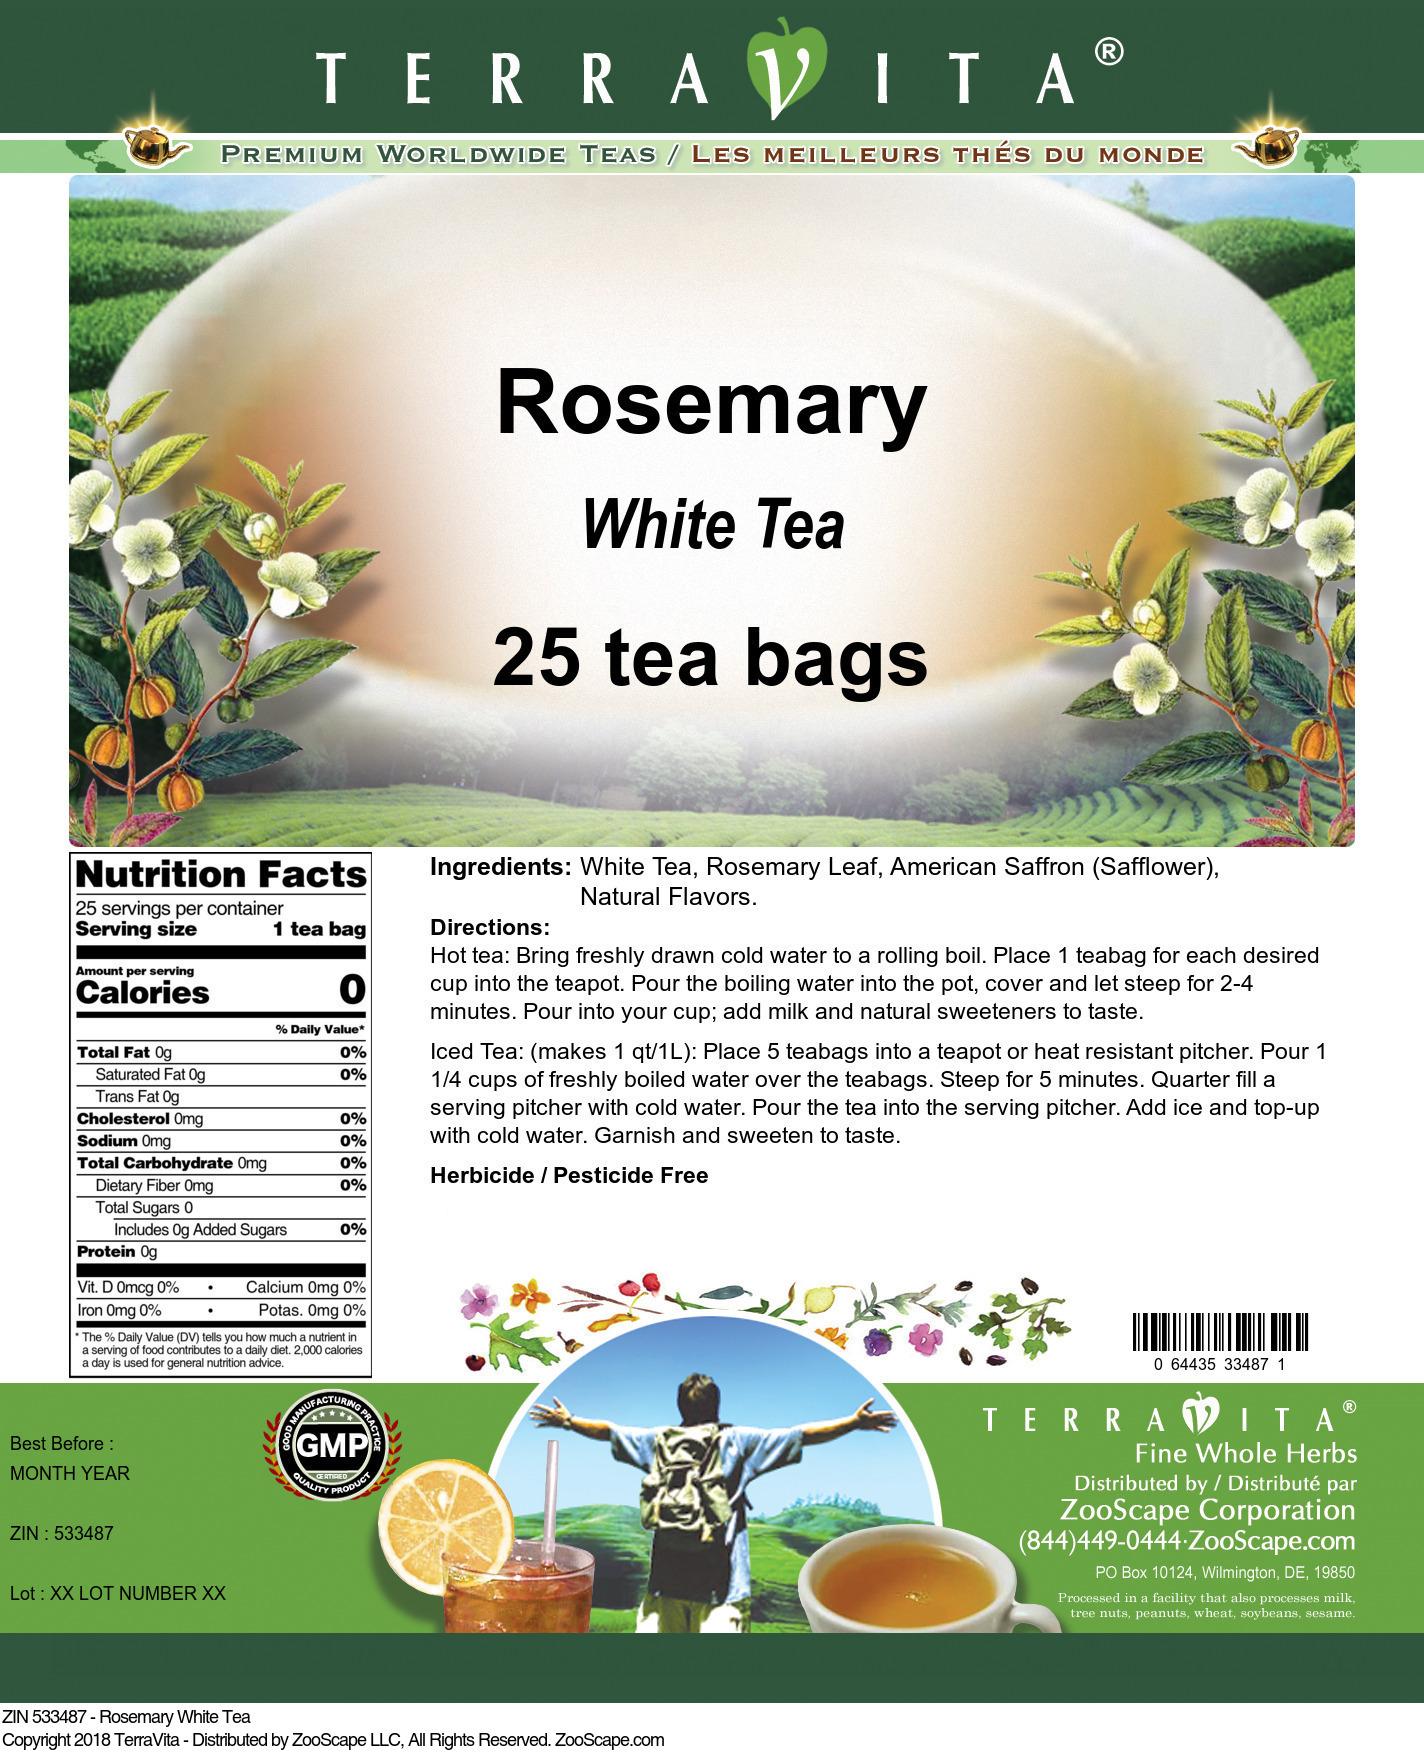 Rosemary White Tea